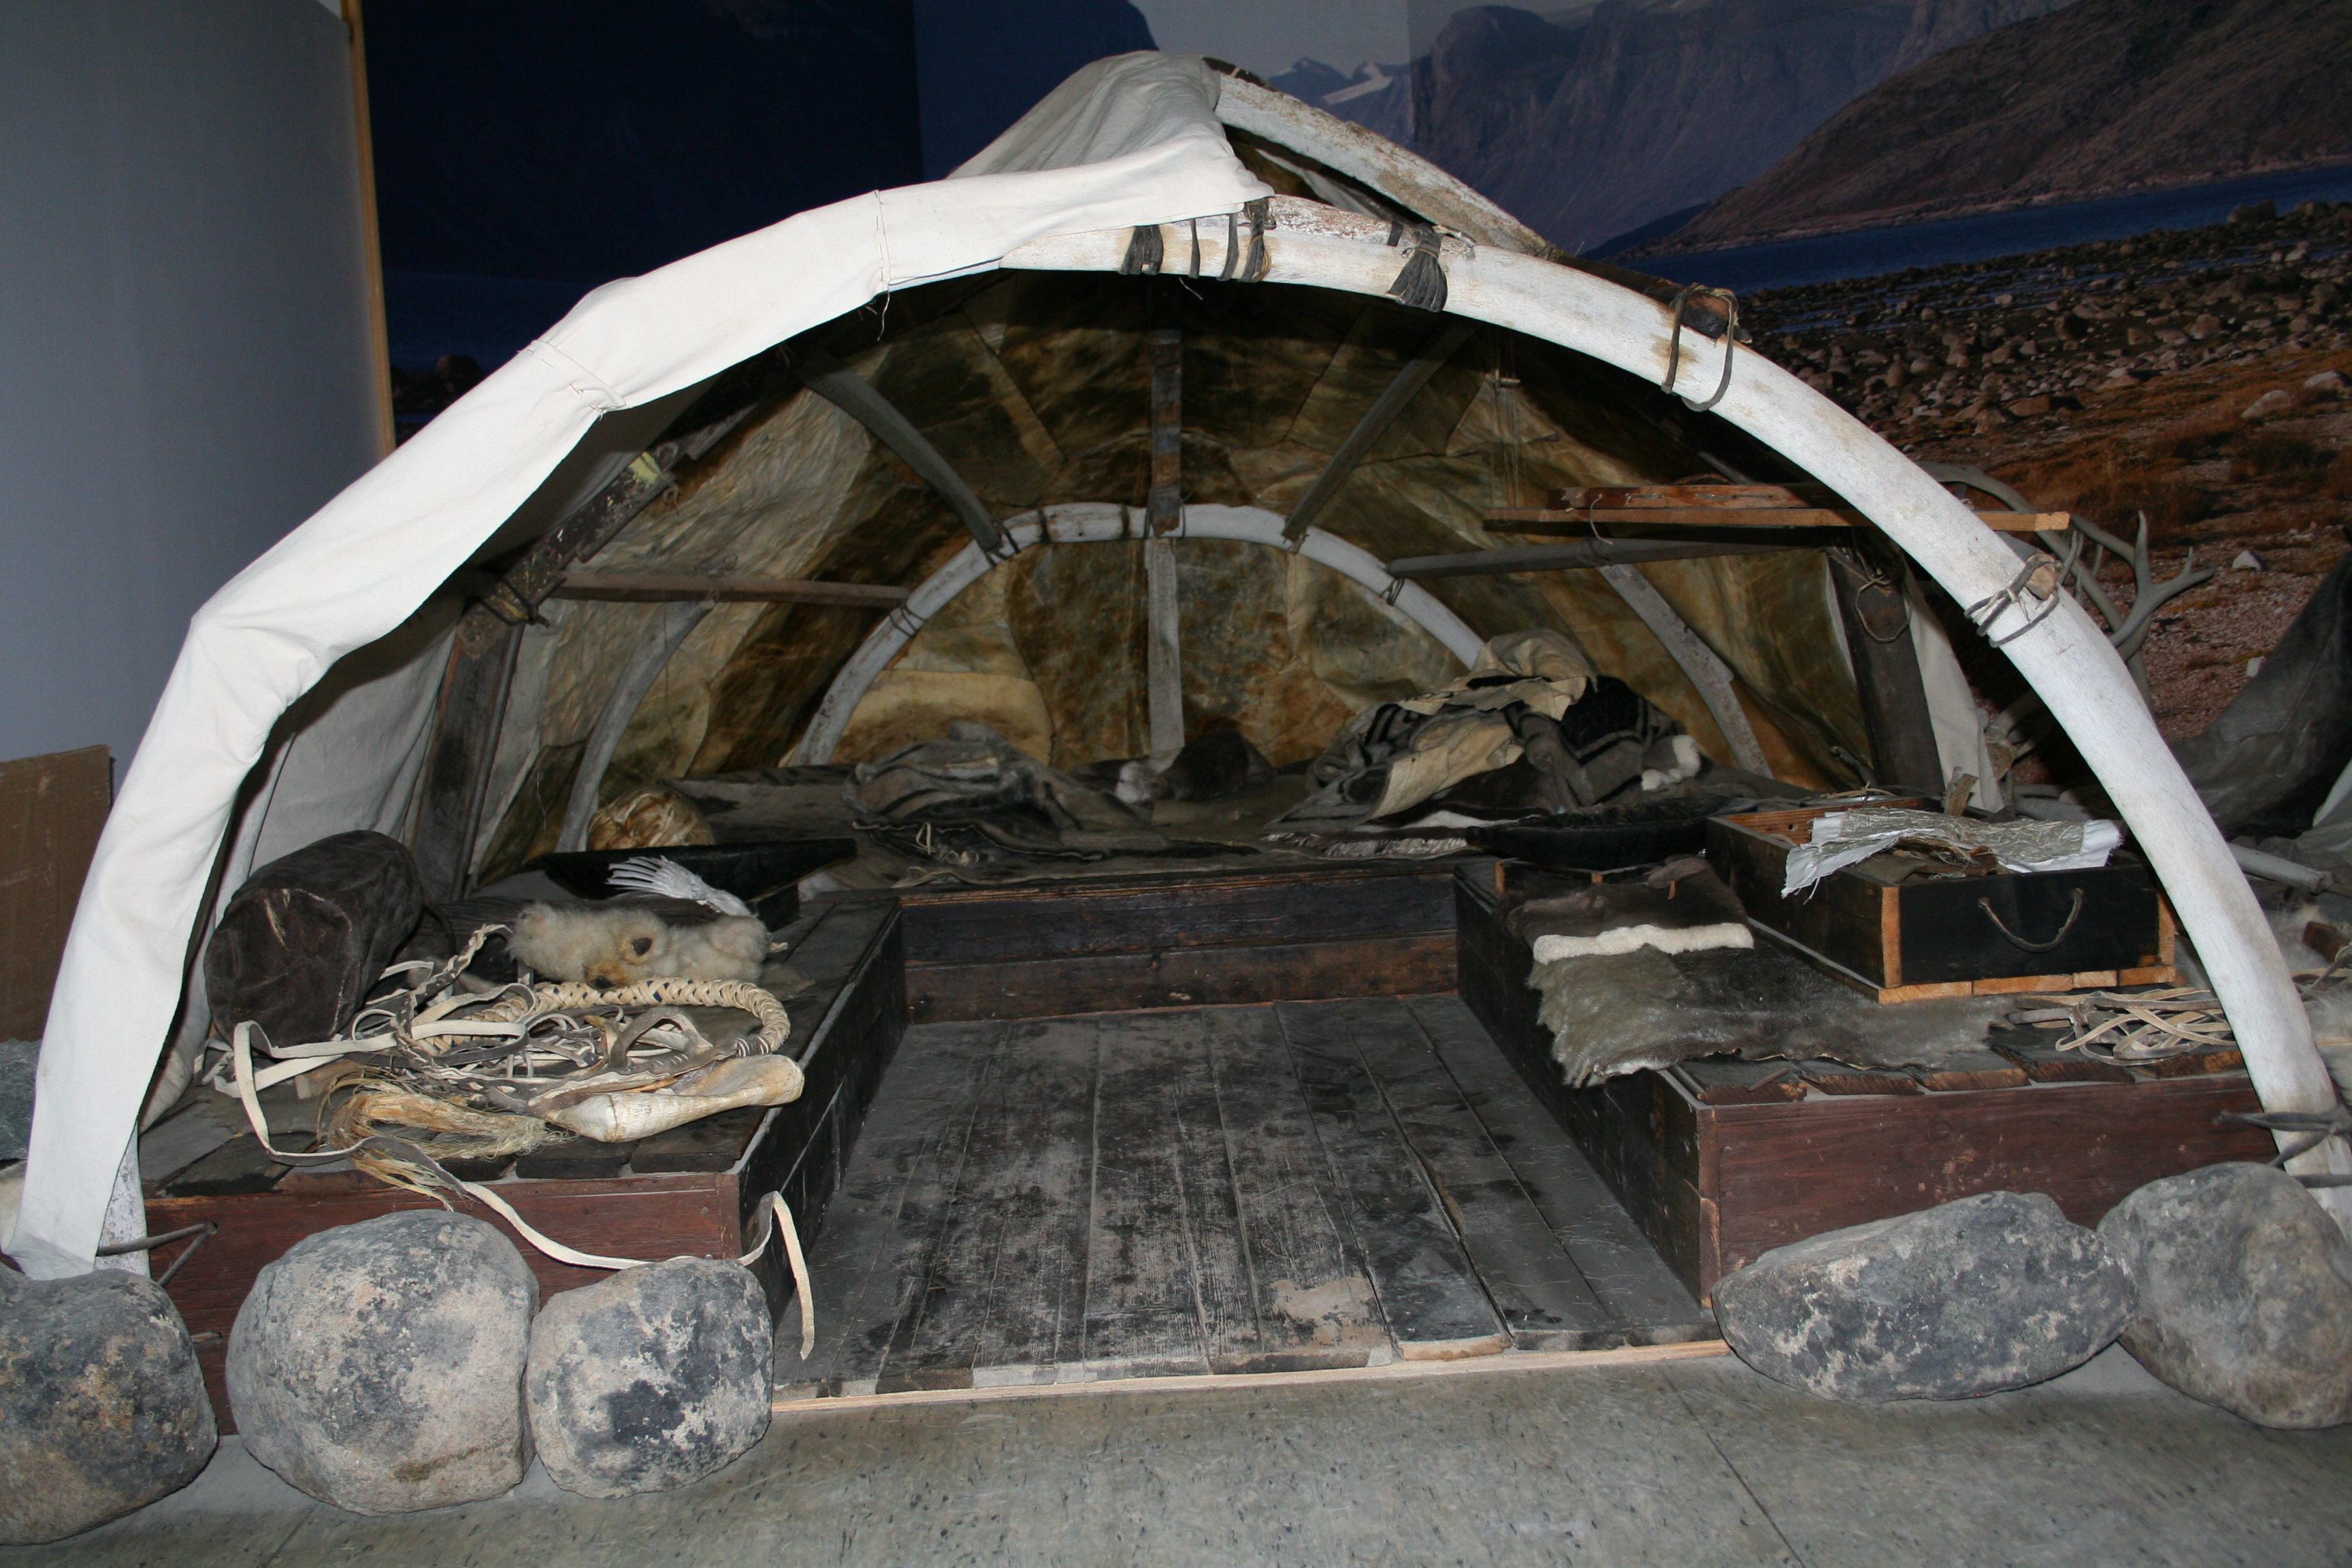 FileInuit Tent Pangnirtung -a.jpg & File:Inuit Tent Pangnirtung -a.jpg - Wikimedia Commons